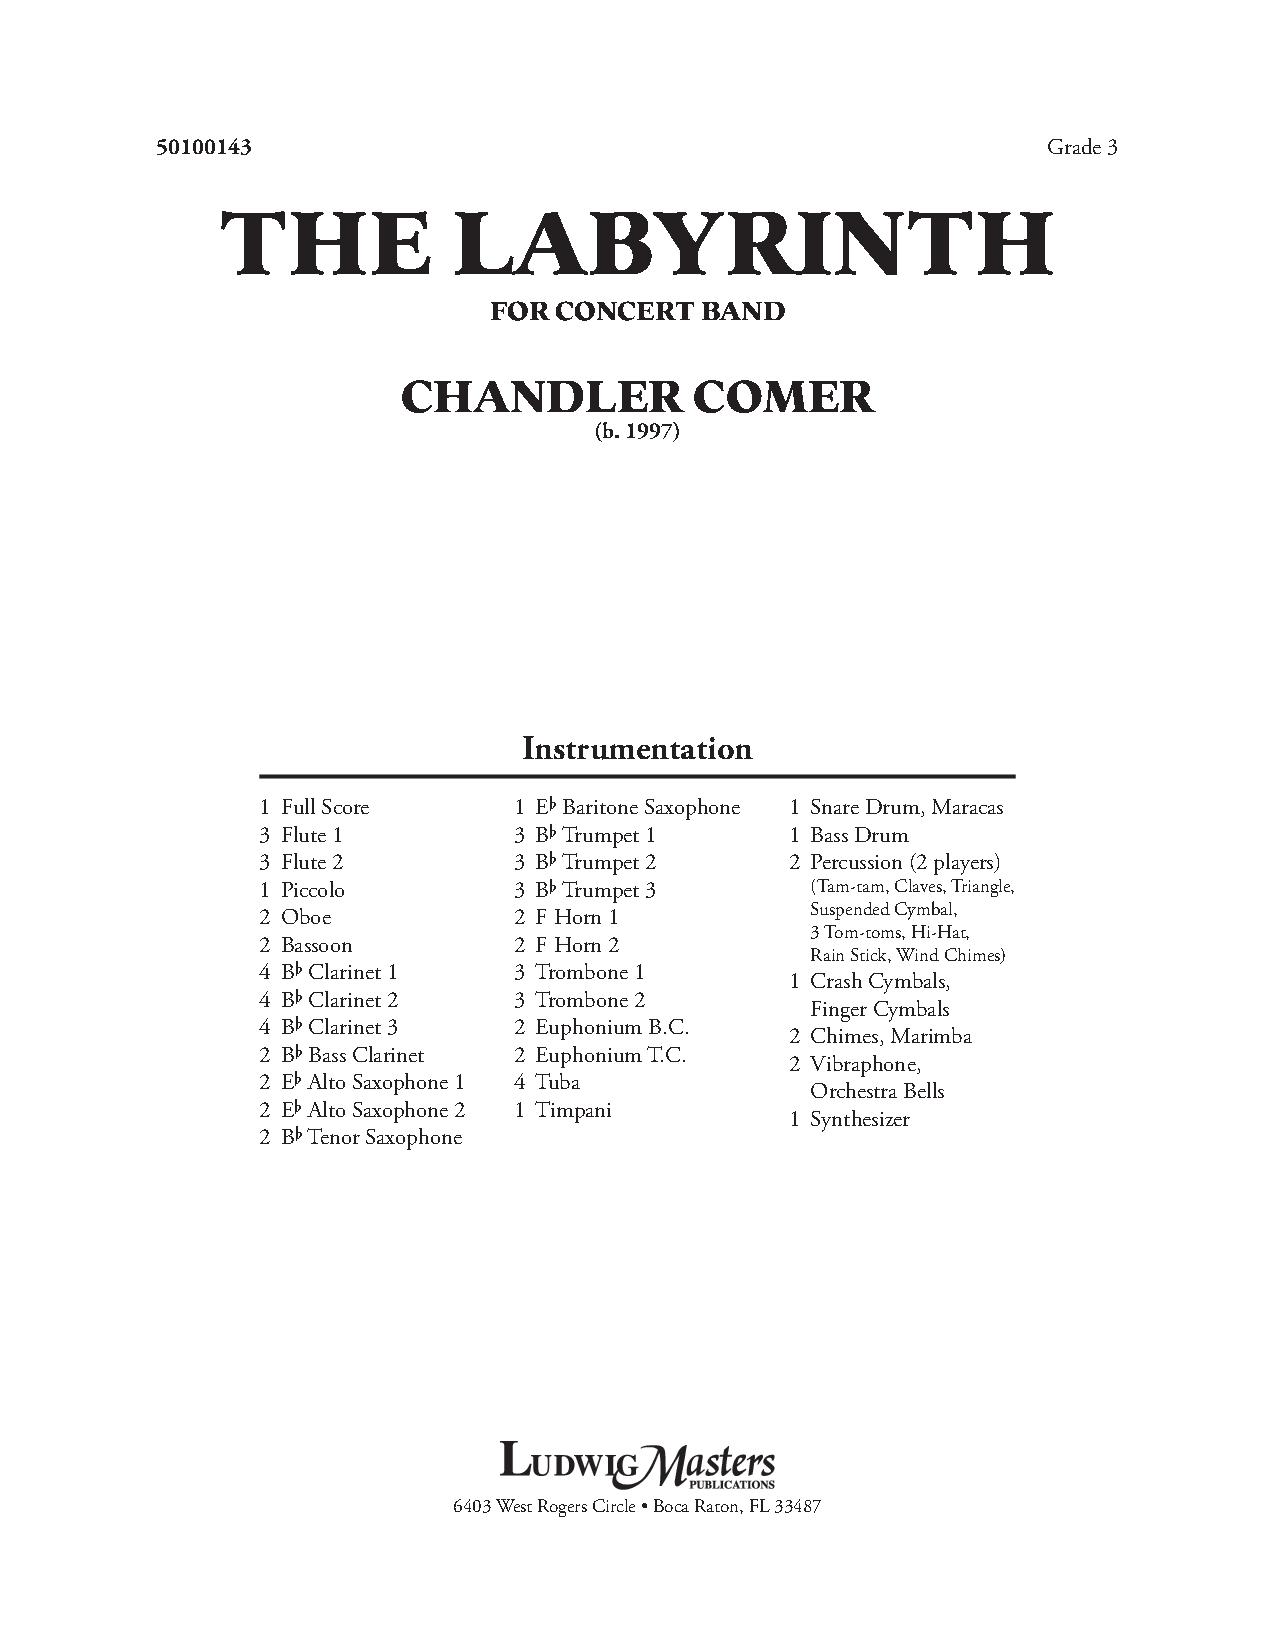 The Labyrinth Thumbnail